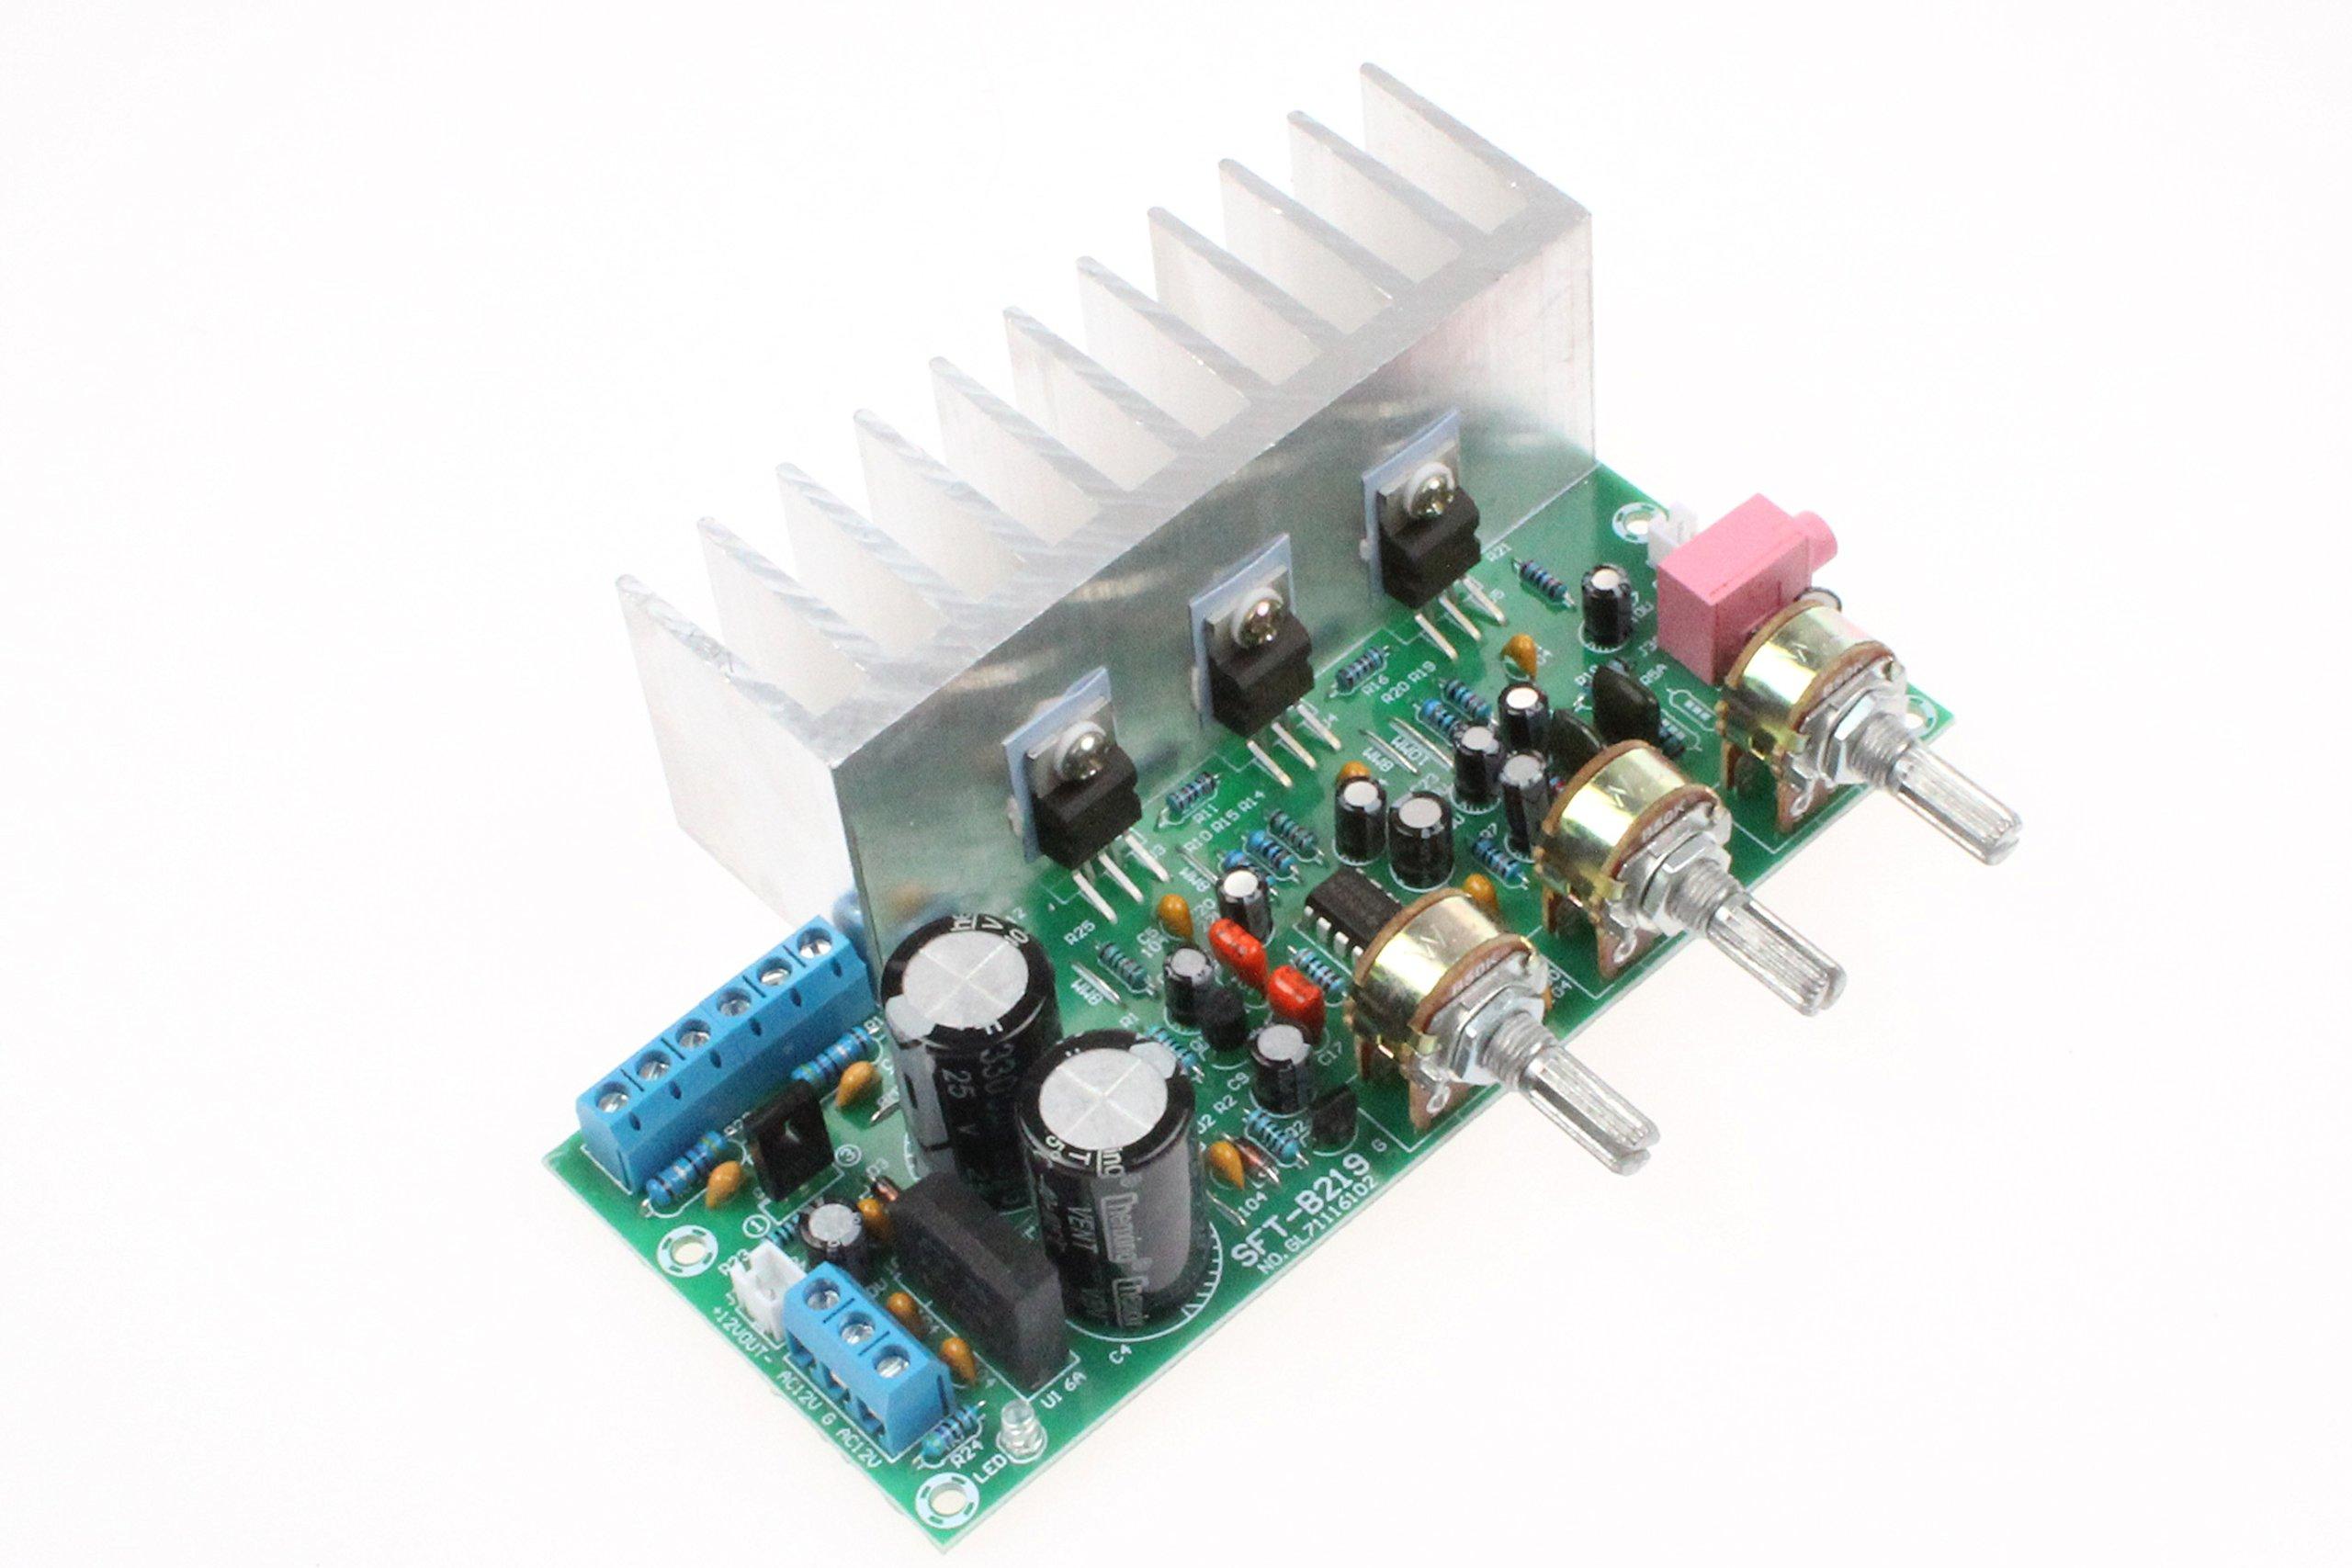 TDA2050 TDA2030 NE5532 2.1 3-Channel Hi-Fi Subwoofer Amplifier Board 18W+18W+32W Compatible with LM1875